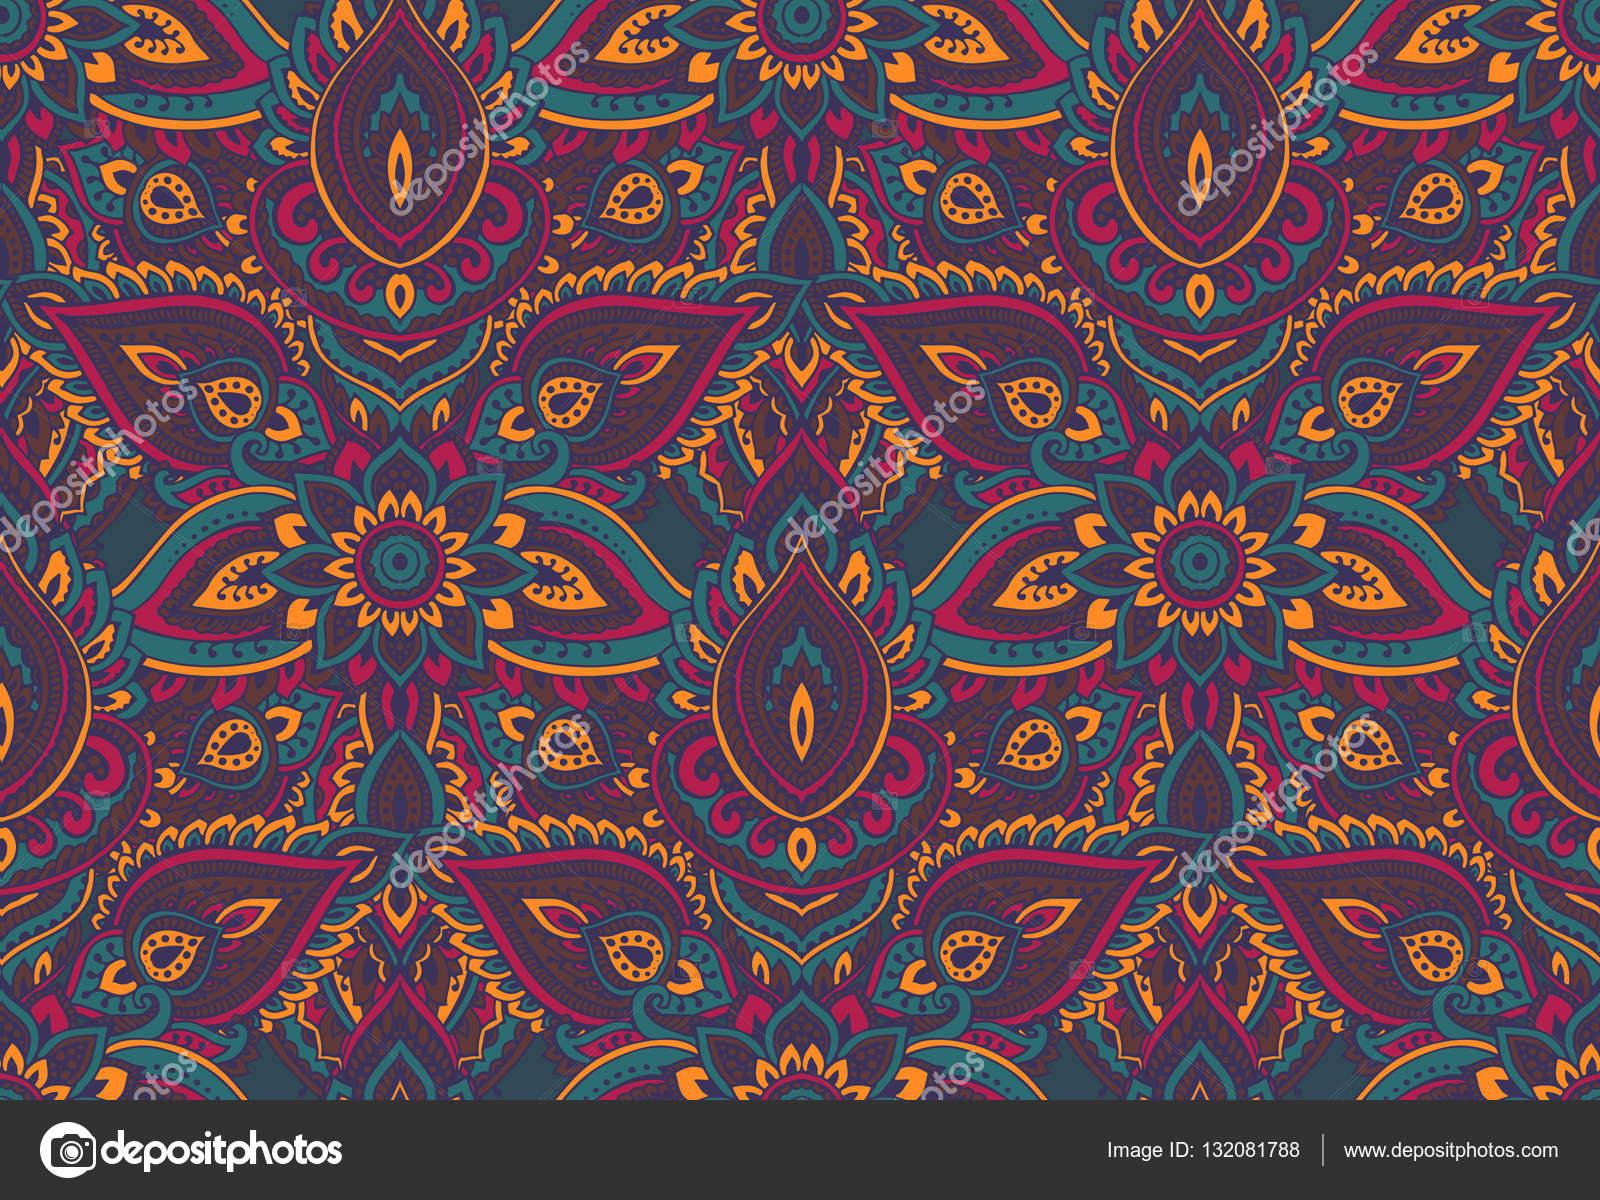 Henna Mehndi Vector : Vector seamless pattern with henna mehndi floral elements. u2014 stock